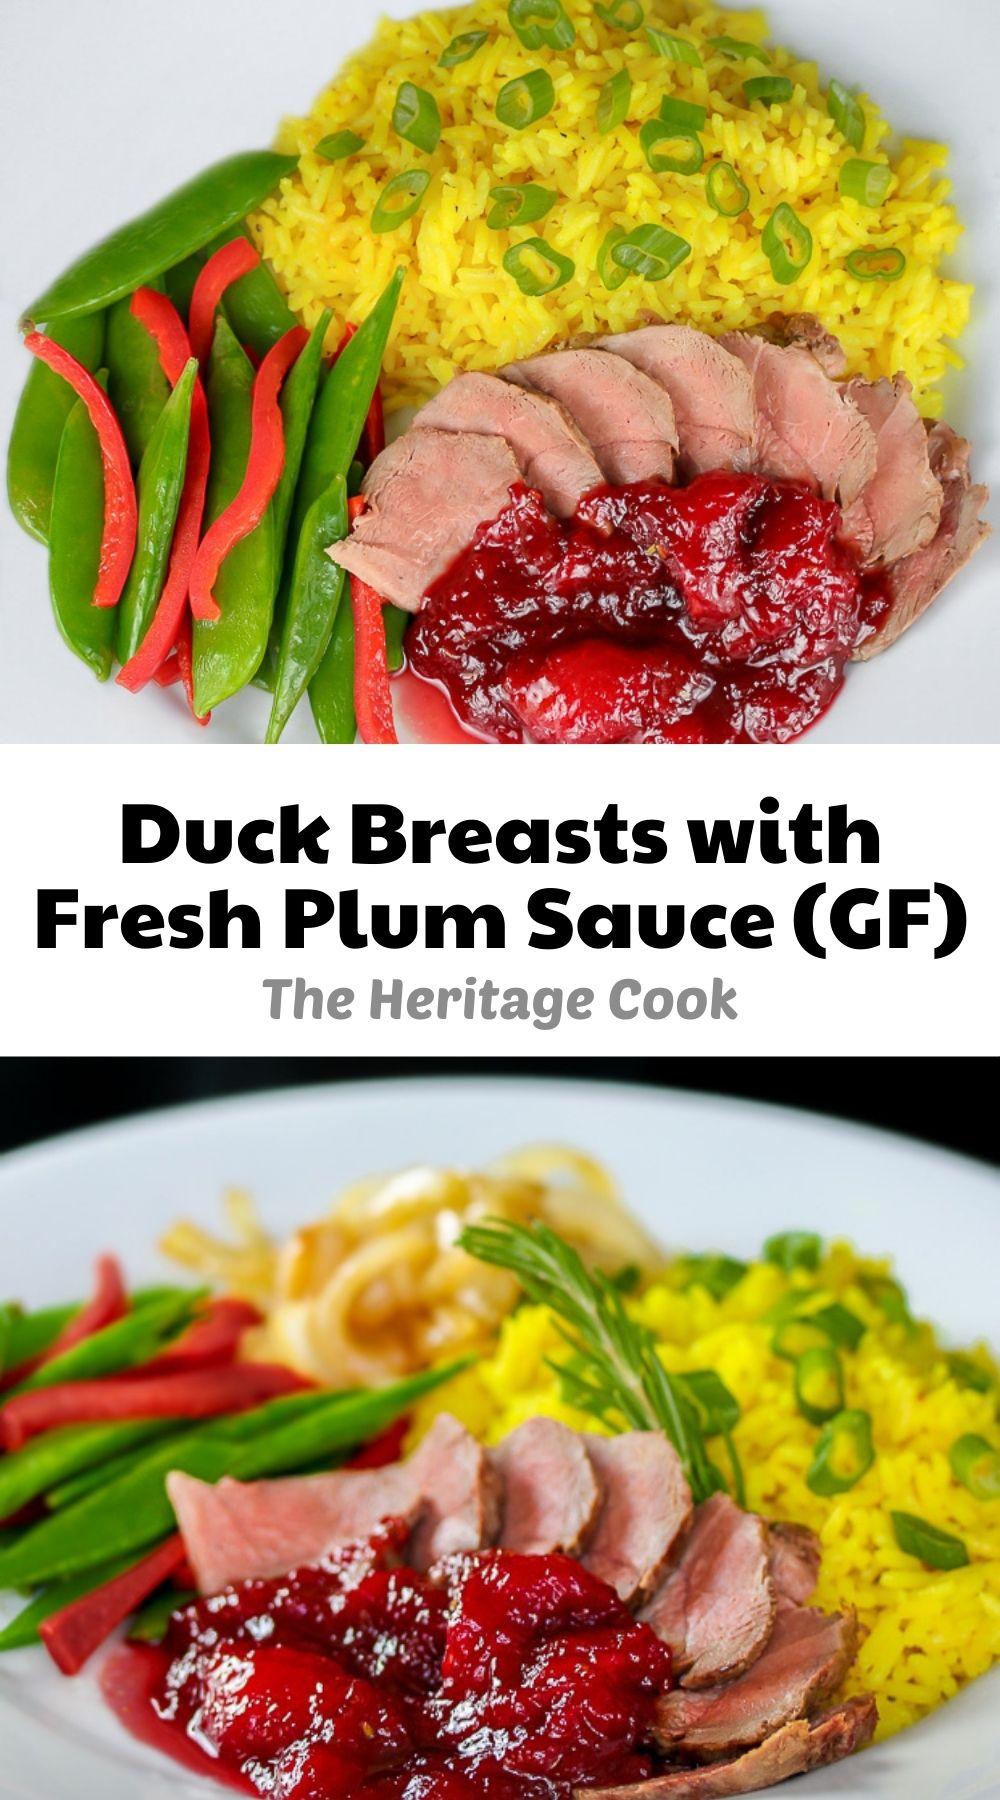 Duck Breasts with Fresh Plum Sauce; © 2021 Jane Bonacci, The Heritage Cook